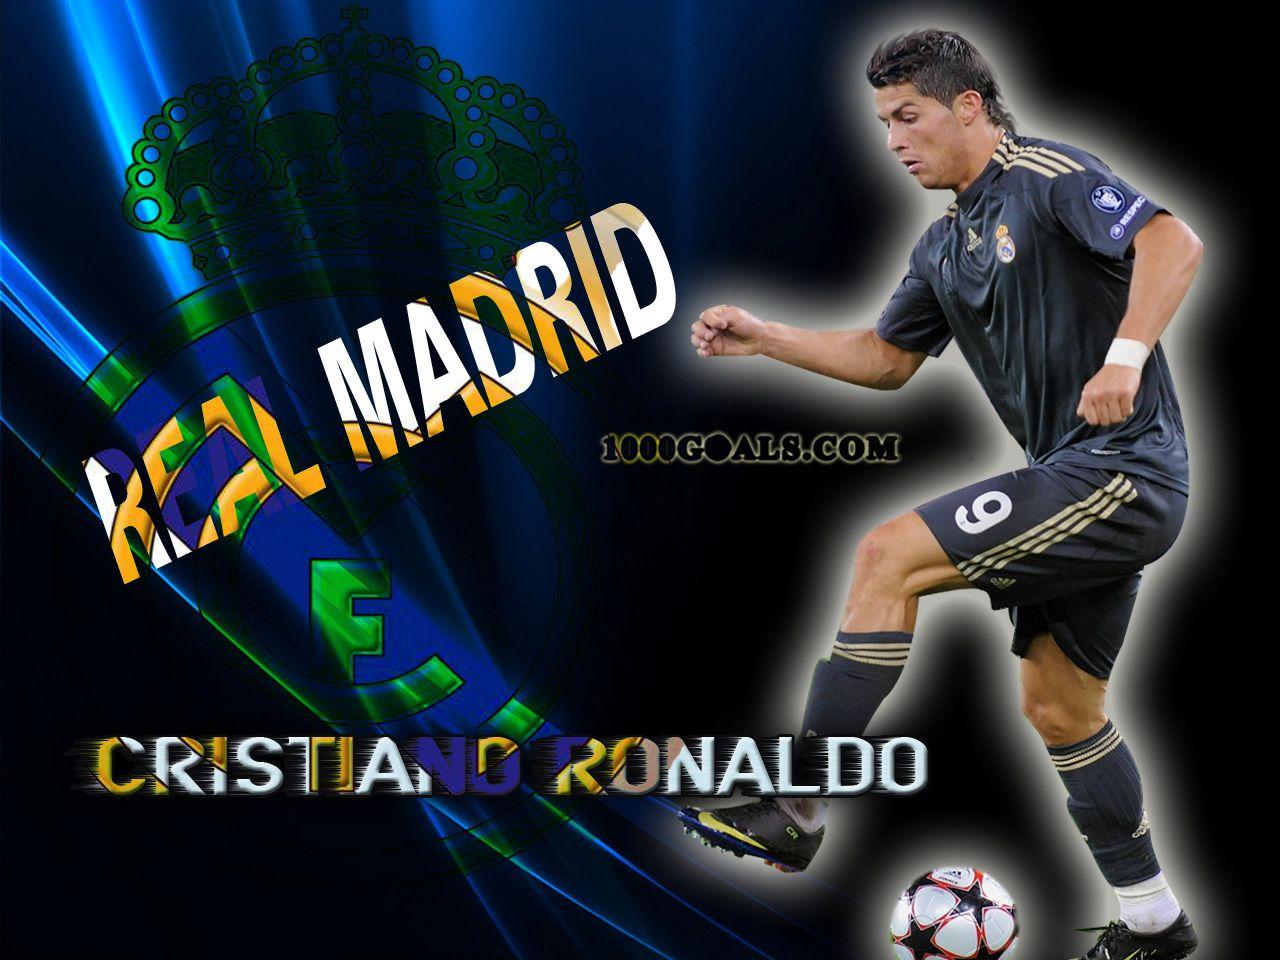 cristiano ronaldo real madrid pics